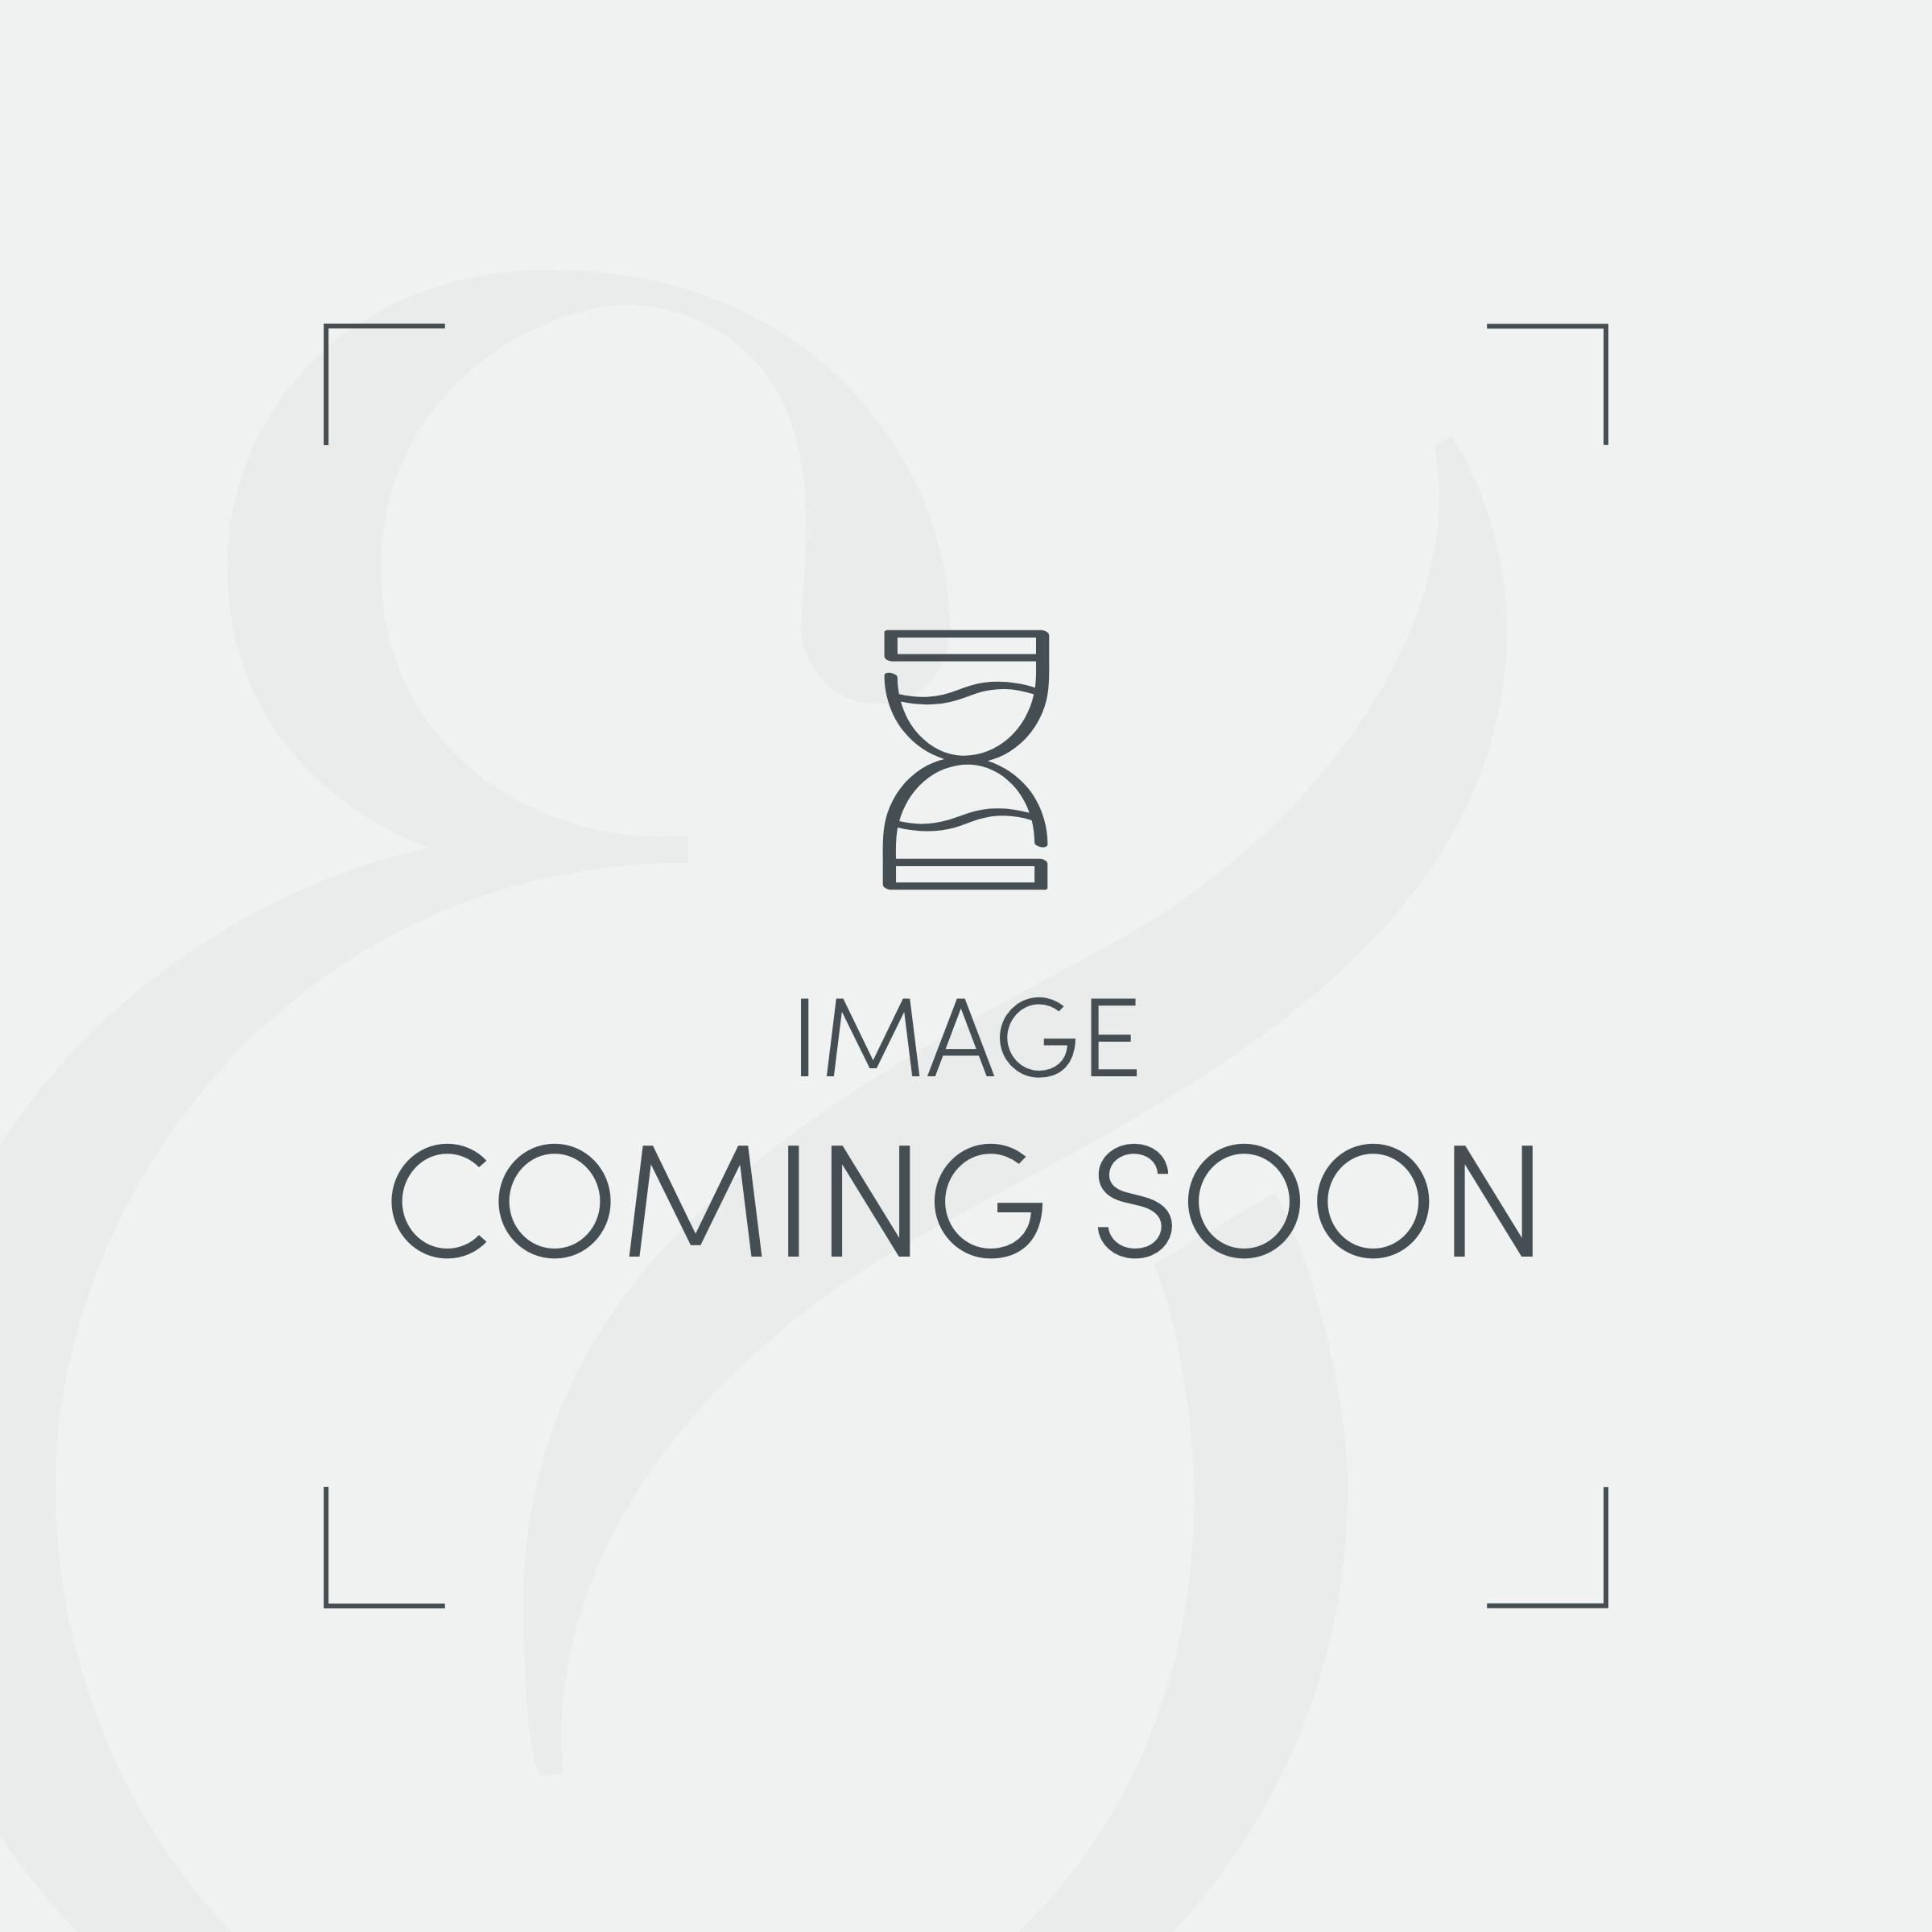 Special Buy 500TC Egyptian Cotton - Double Flat Sheet - White